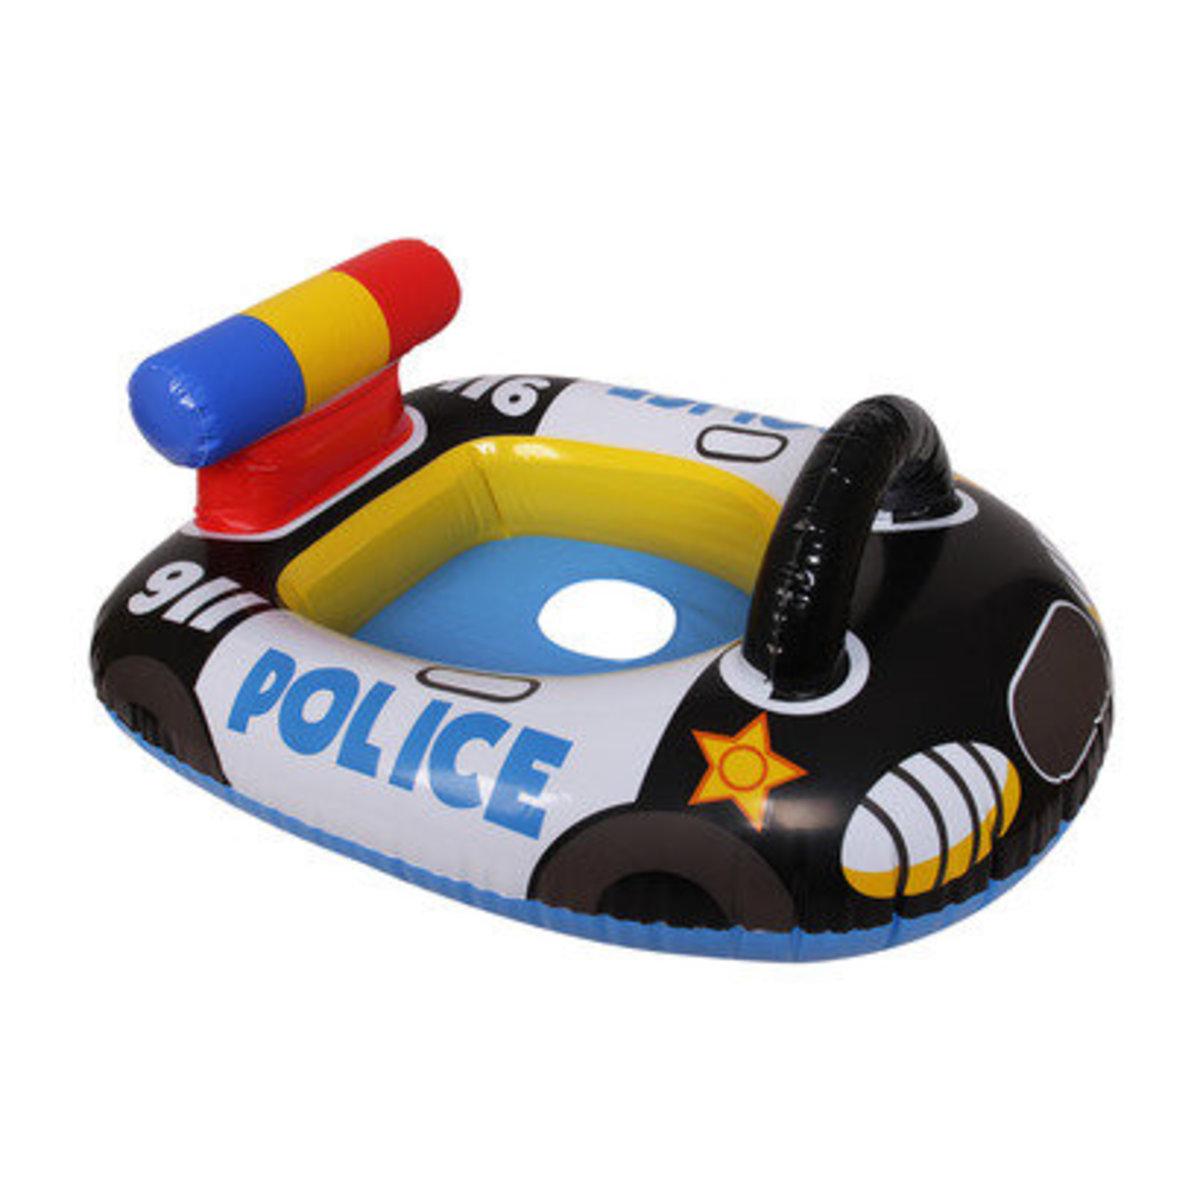 "Kids Police Car Pool Rider 32""x28.5"" (81cm x 72cm)"